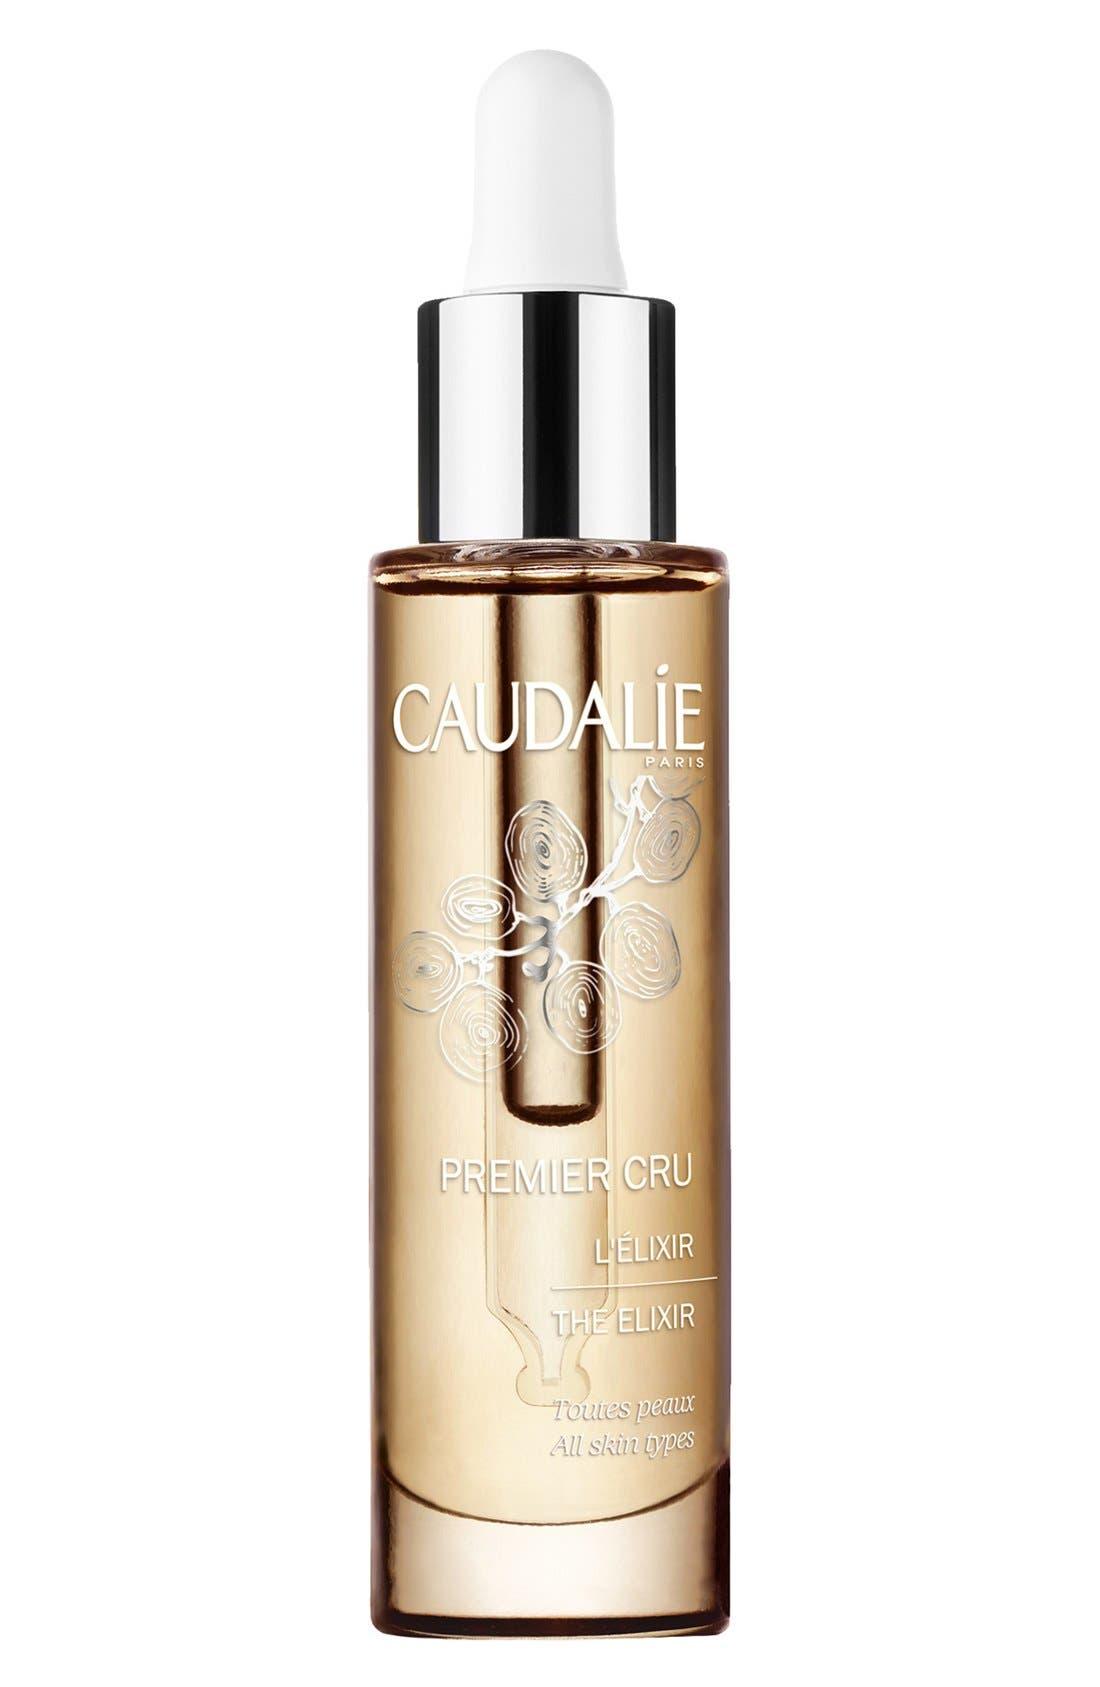 CAUDALÍE 'Premier Cru - The Elixir' Dry Oil